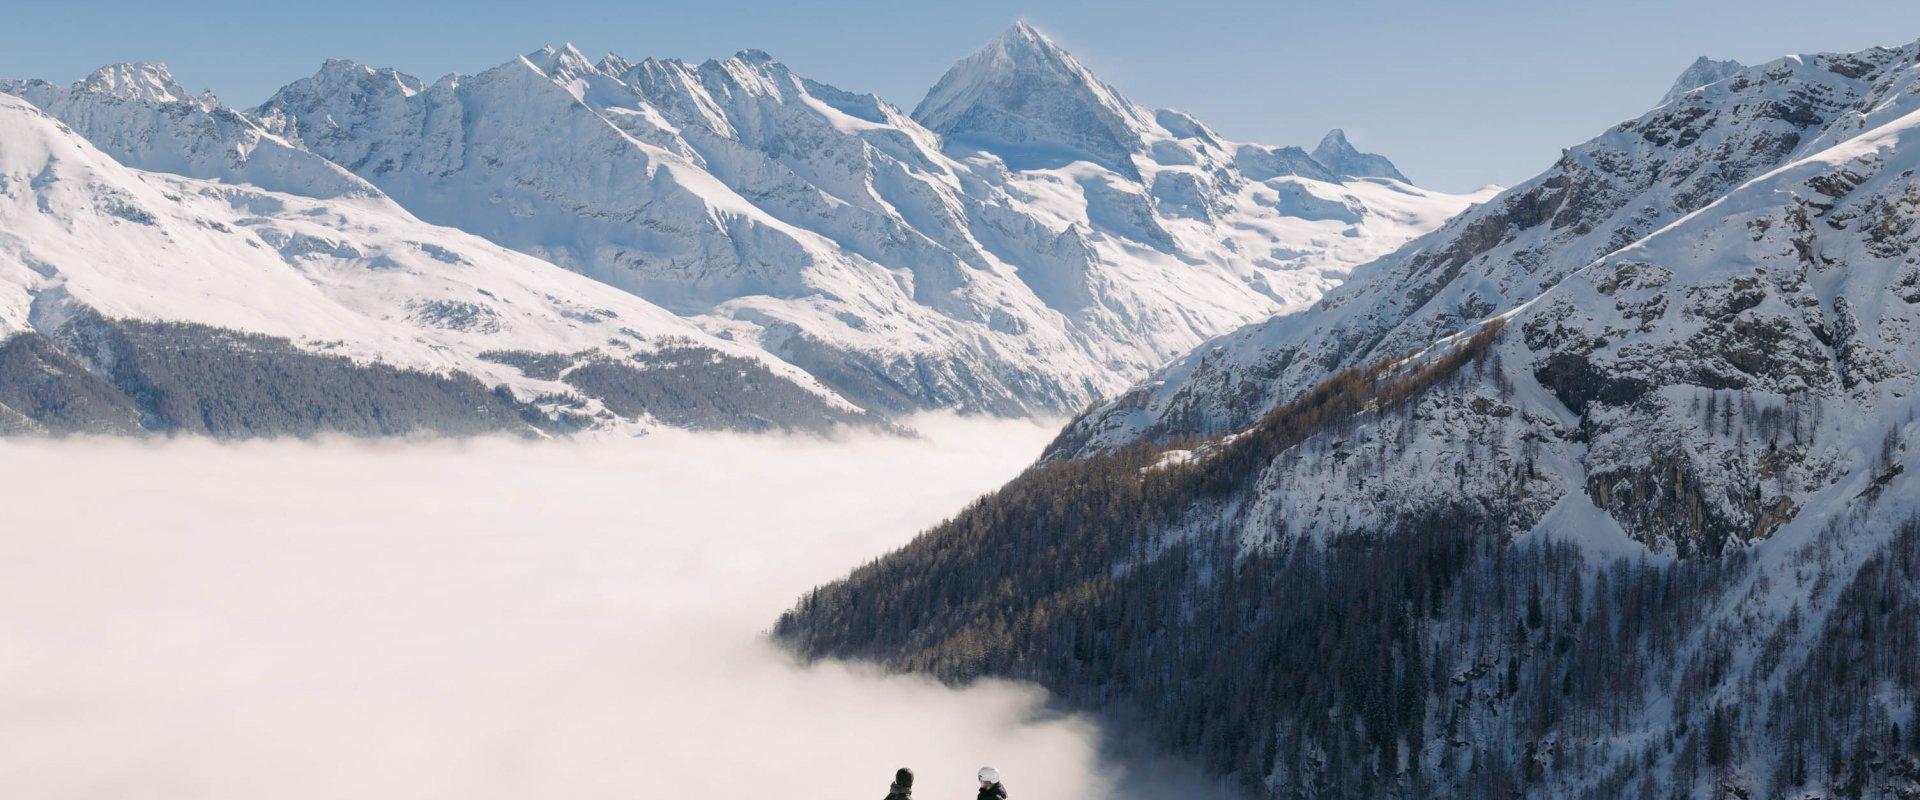 Alpine skiing - Espace Dent Blanche